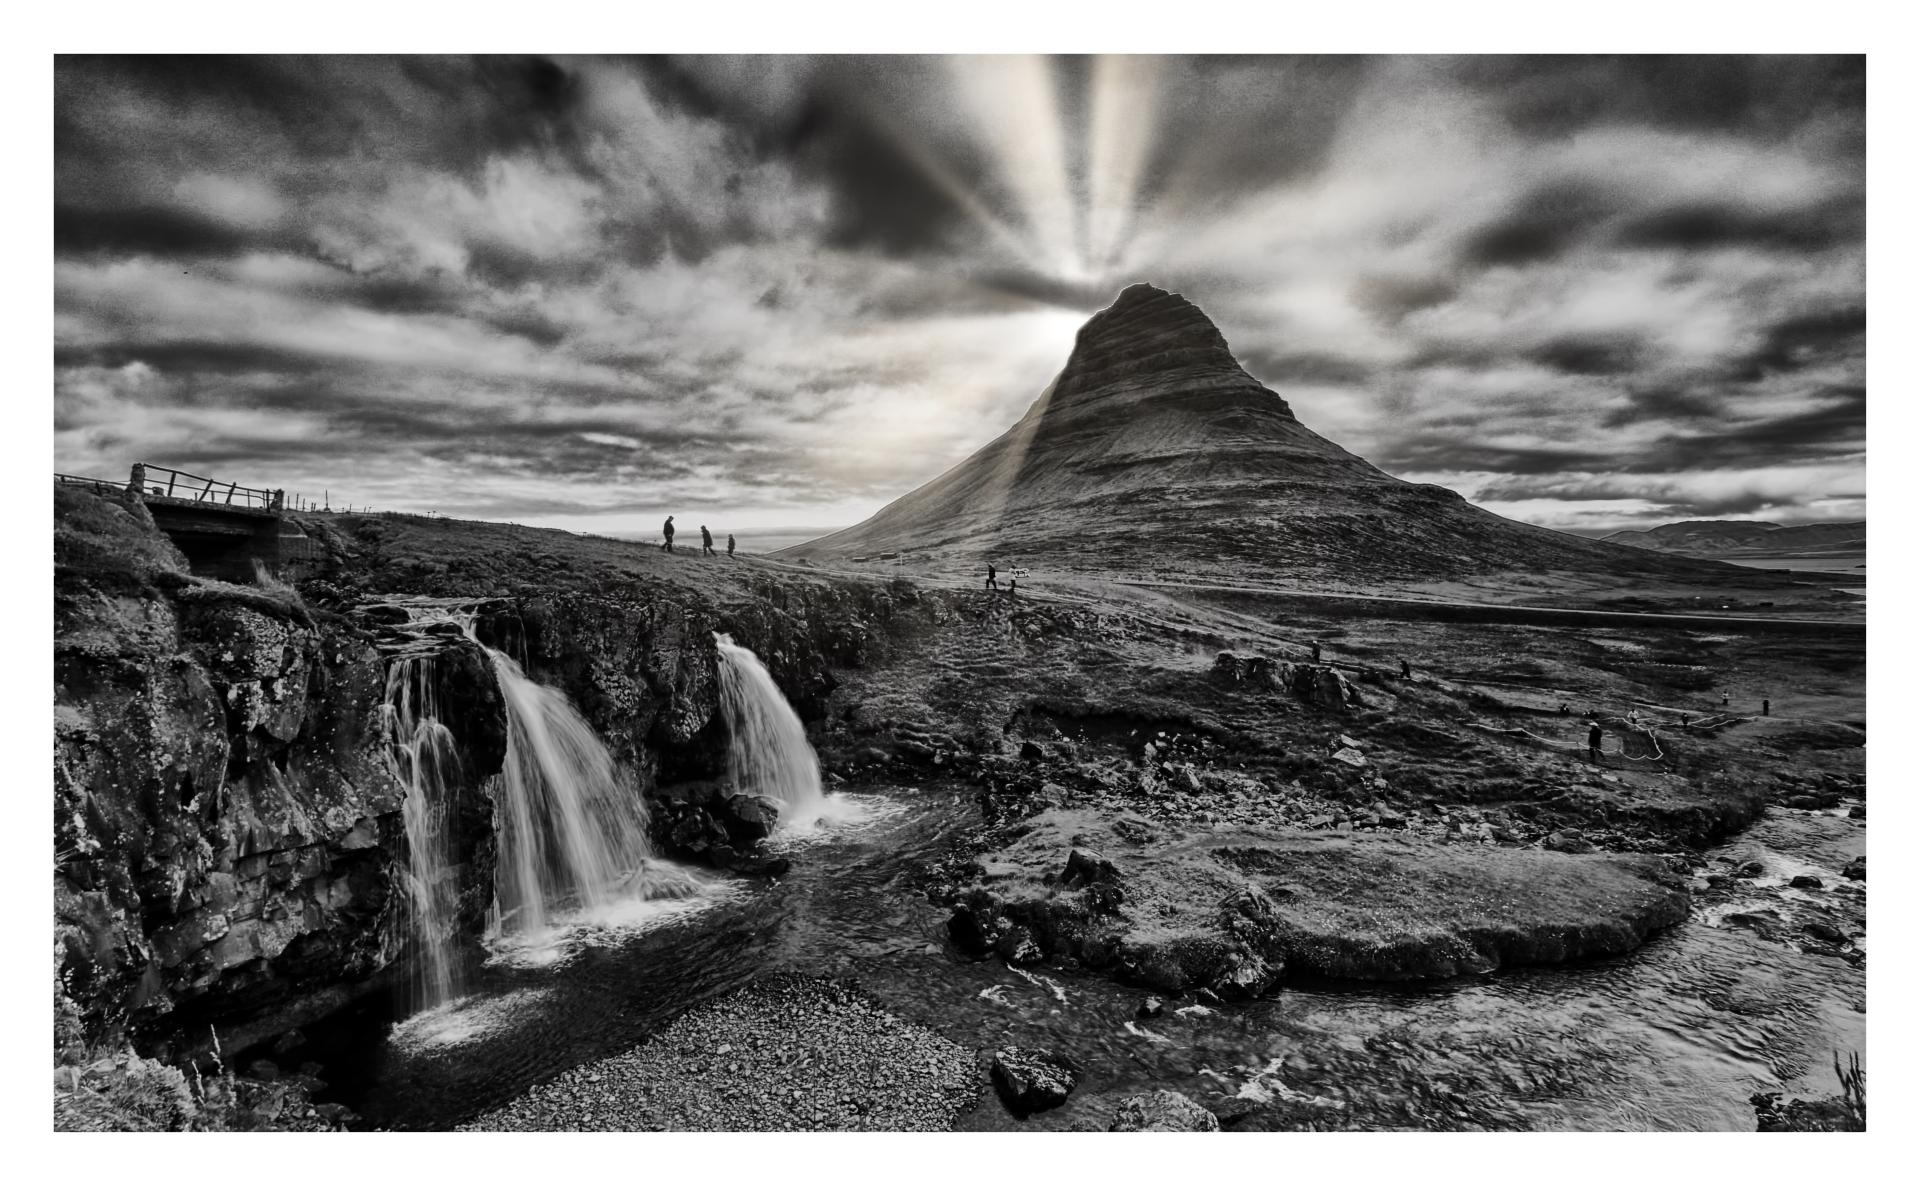 sun-beams-behind-Kirkjufell-mountain-in-Iceland-MI-1-Place-by-Sree-Alavattam-PE